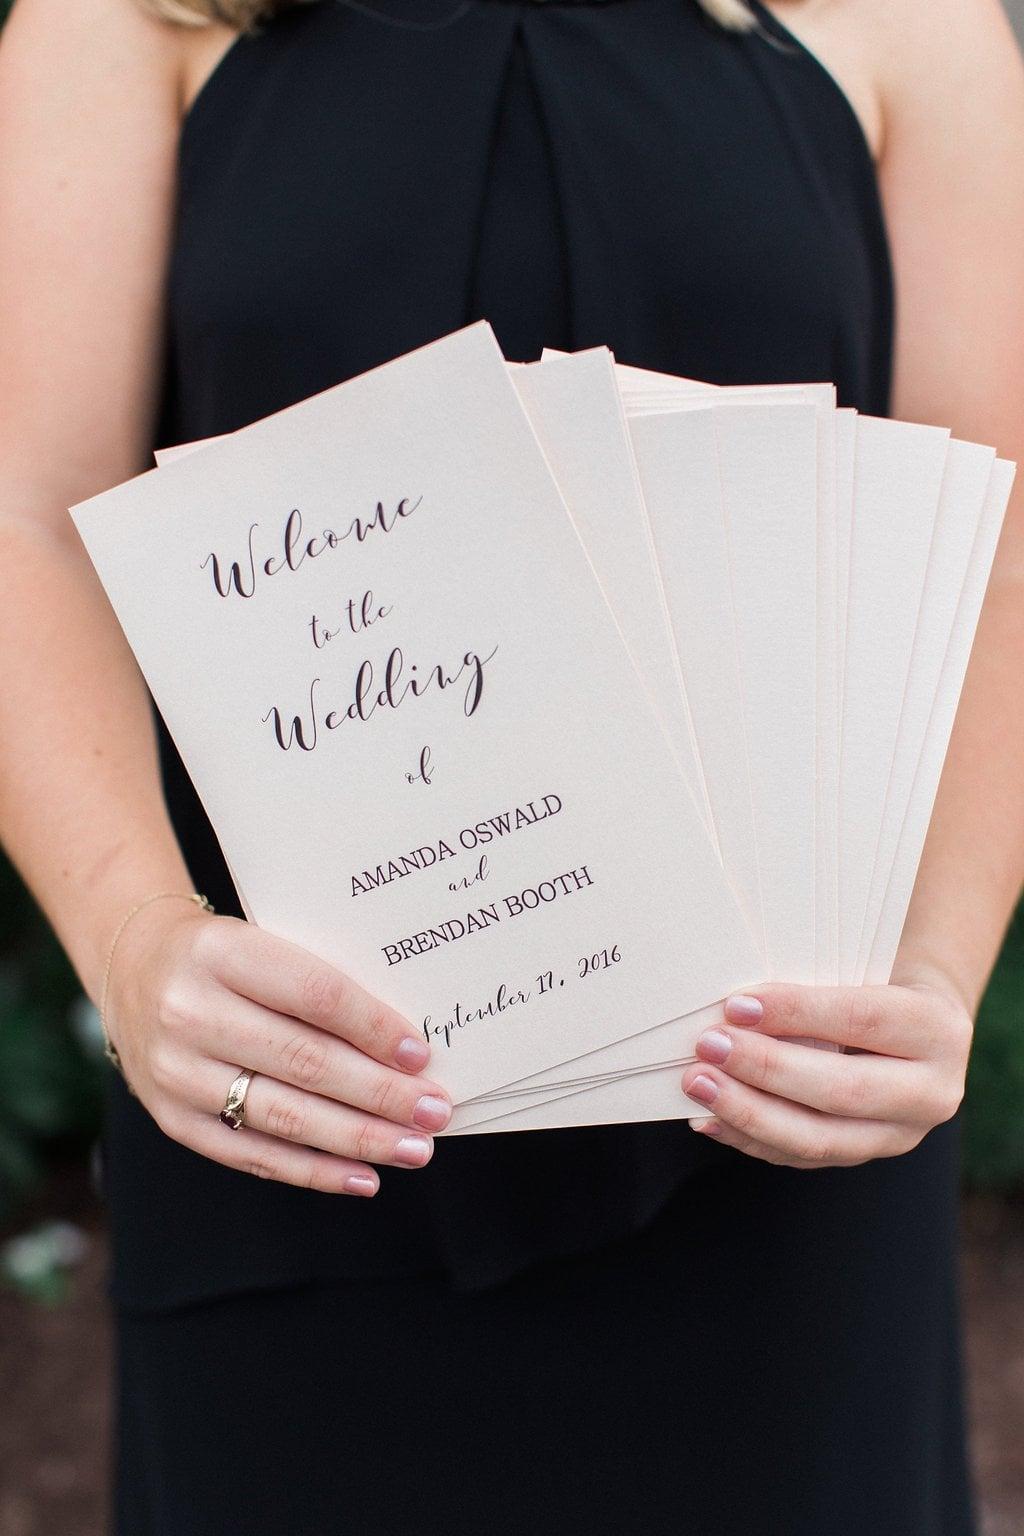 Bridesmaid holding wedding programs